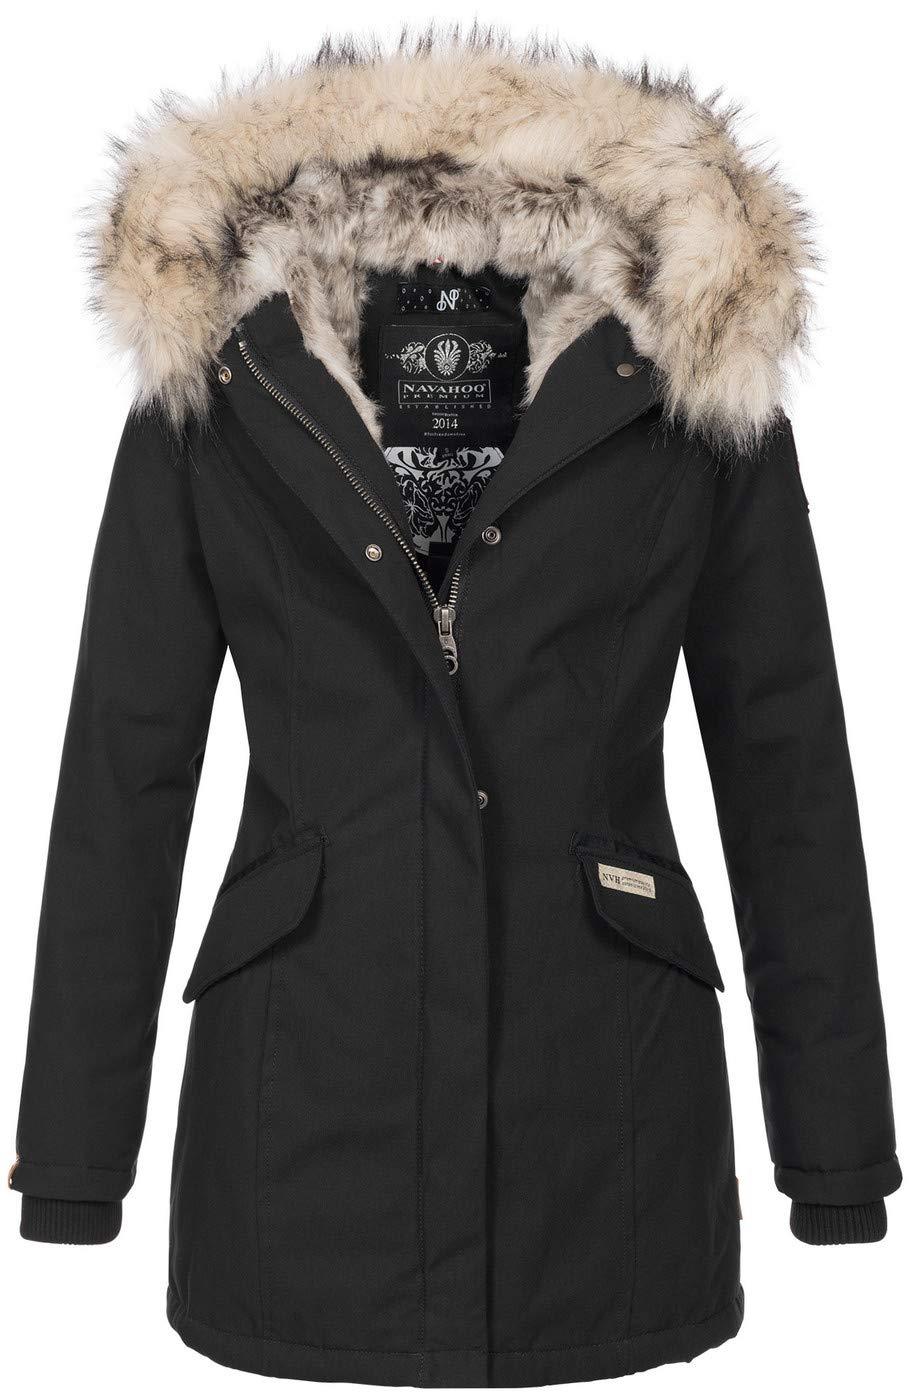 Navahoo Premium Very Warm Ladies Winter Jacket Winter